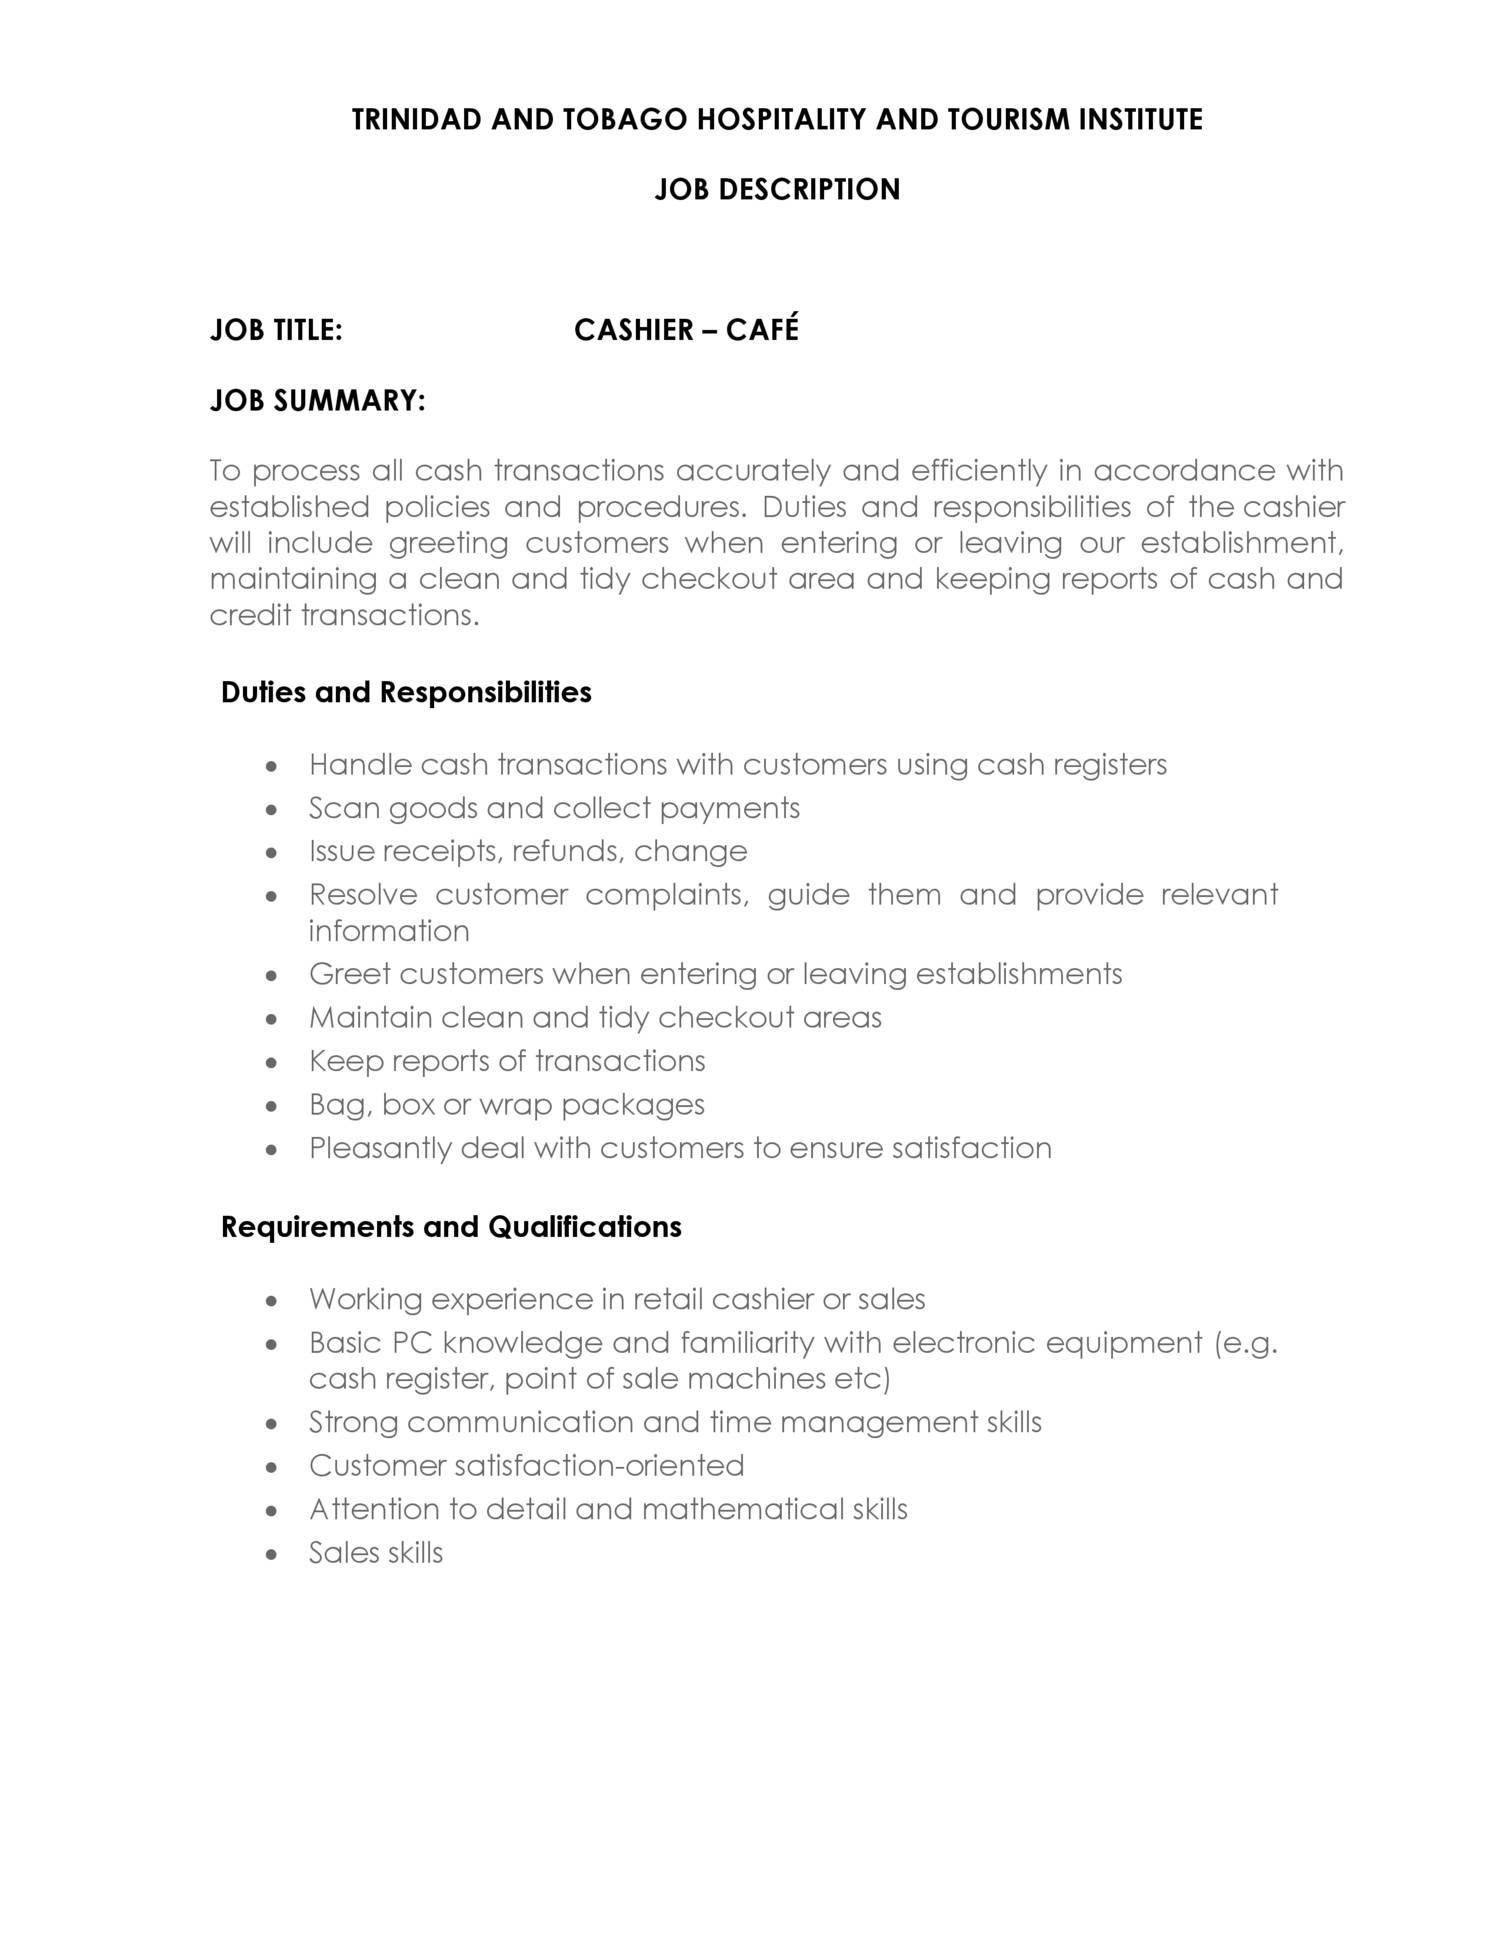 job description of cashier